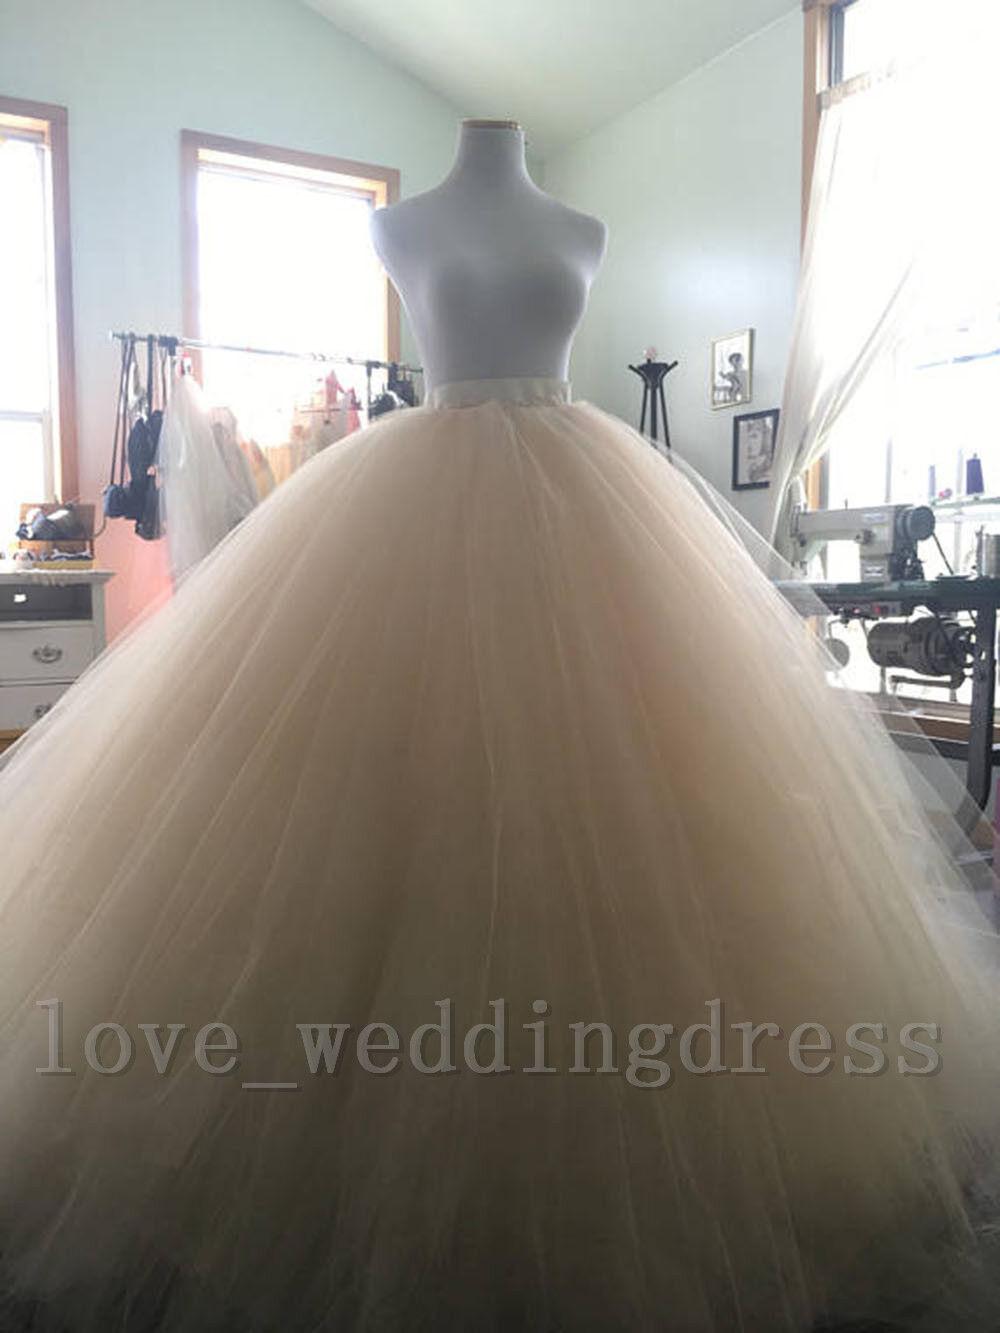 Vintage Long Wedding Bridal Skirt Tulle Tutu Women Wedding Ball Party Prom Skirt